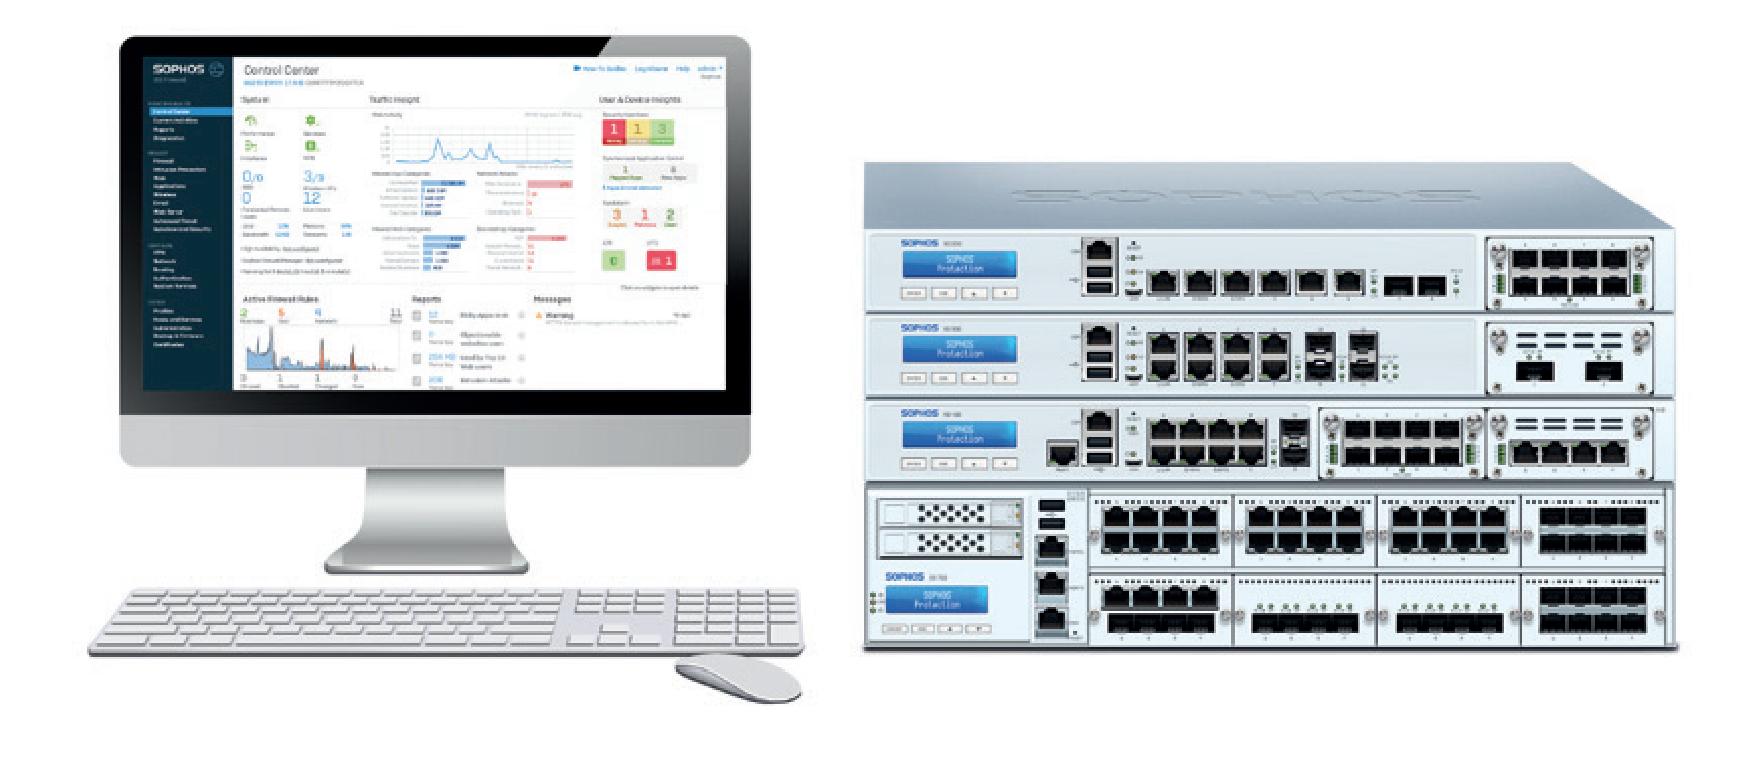 Sophos XG Firewall: От классического МЭ до NGFW с автоматической реакцией на ИБ инциденты